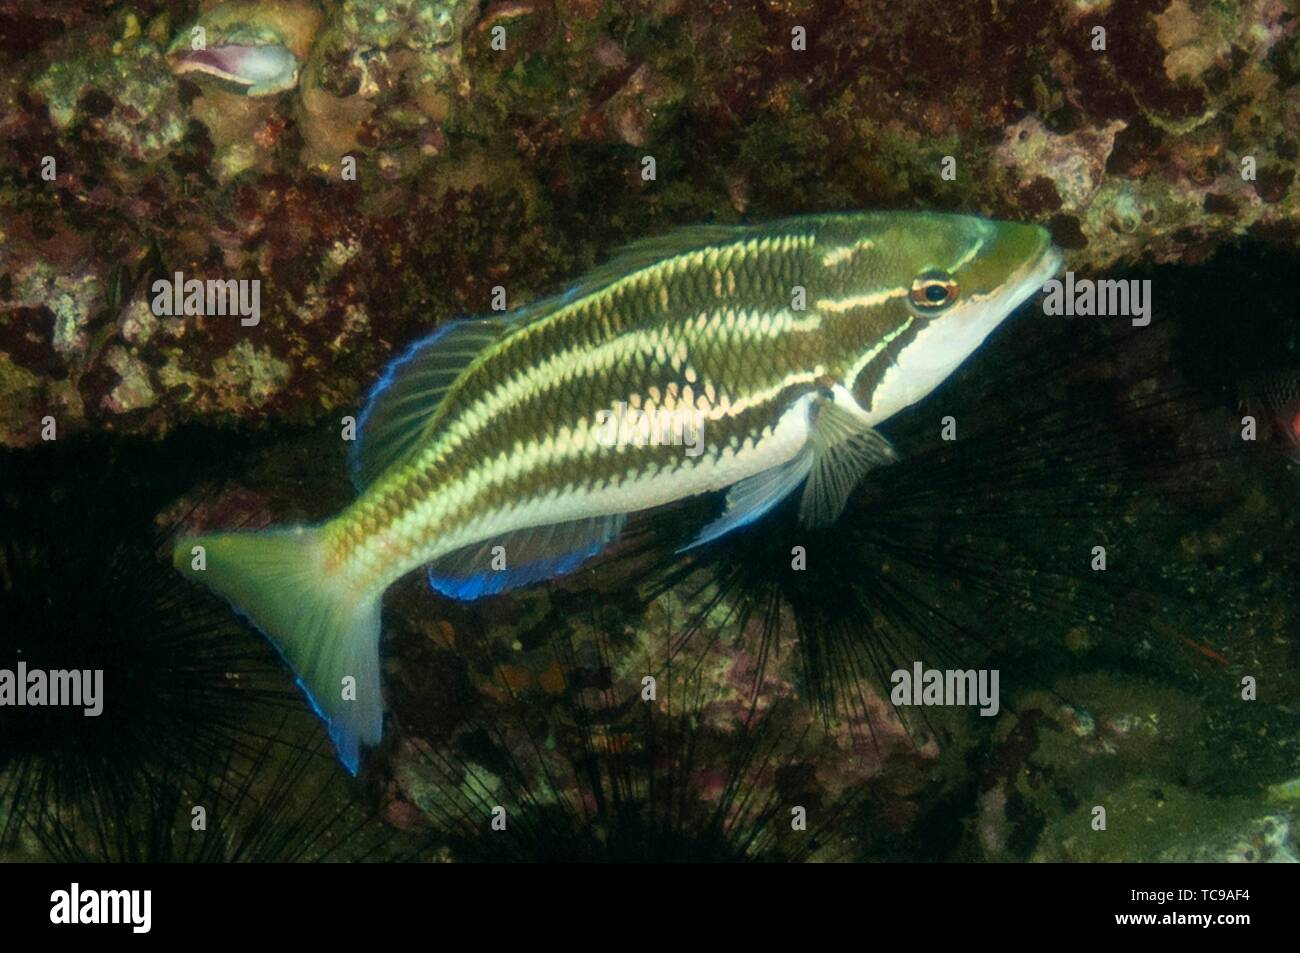 Three-striped Whiptail (Pentapodus trivittatus), Banda Neira Jetty dive site, Ambon, Maluku (Moluccas), Indonesia. - Stock Image